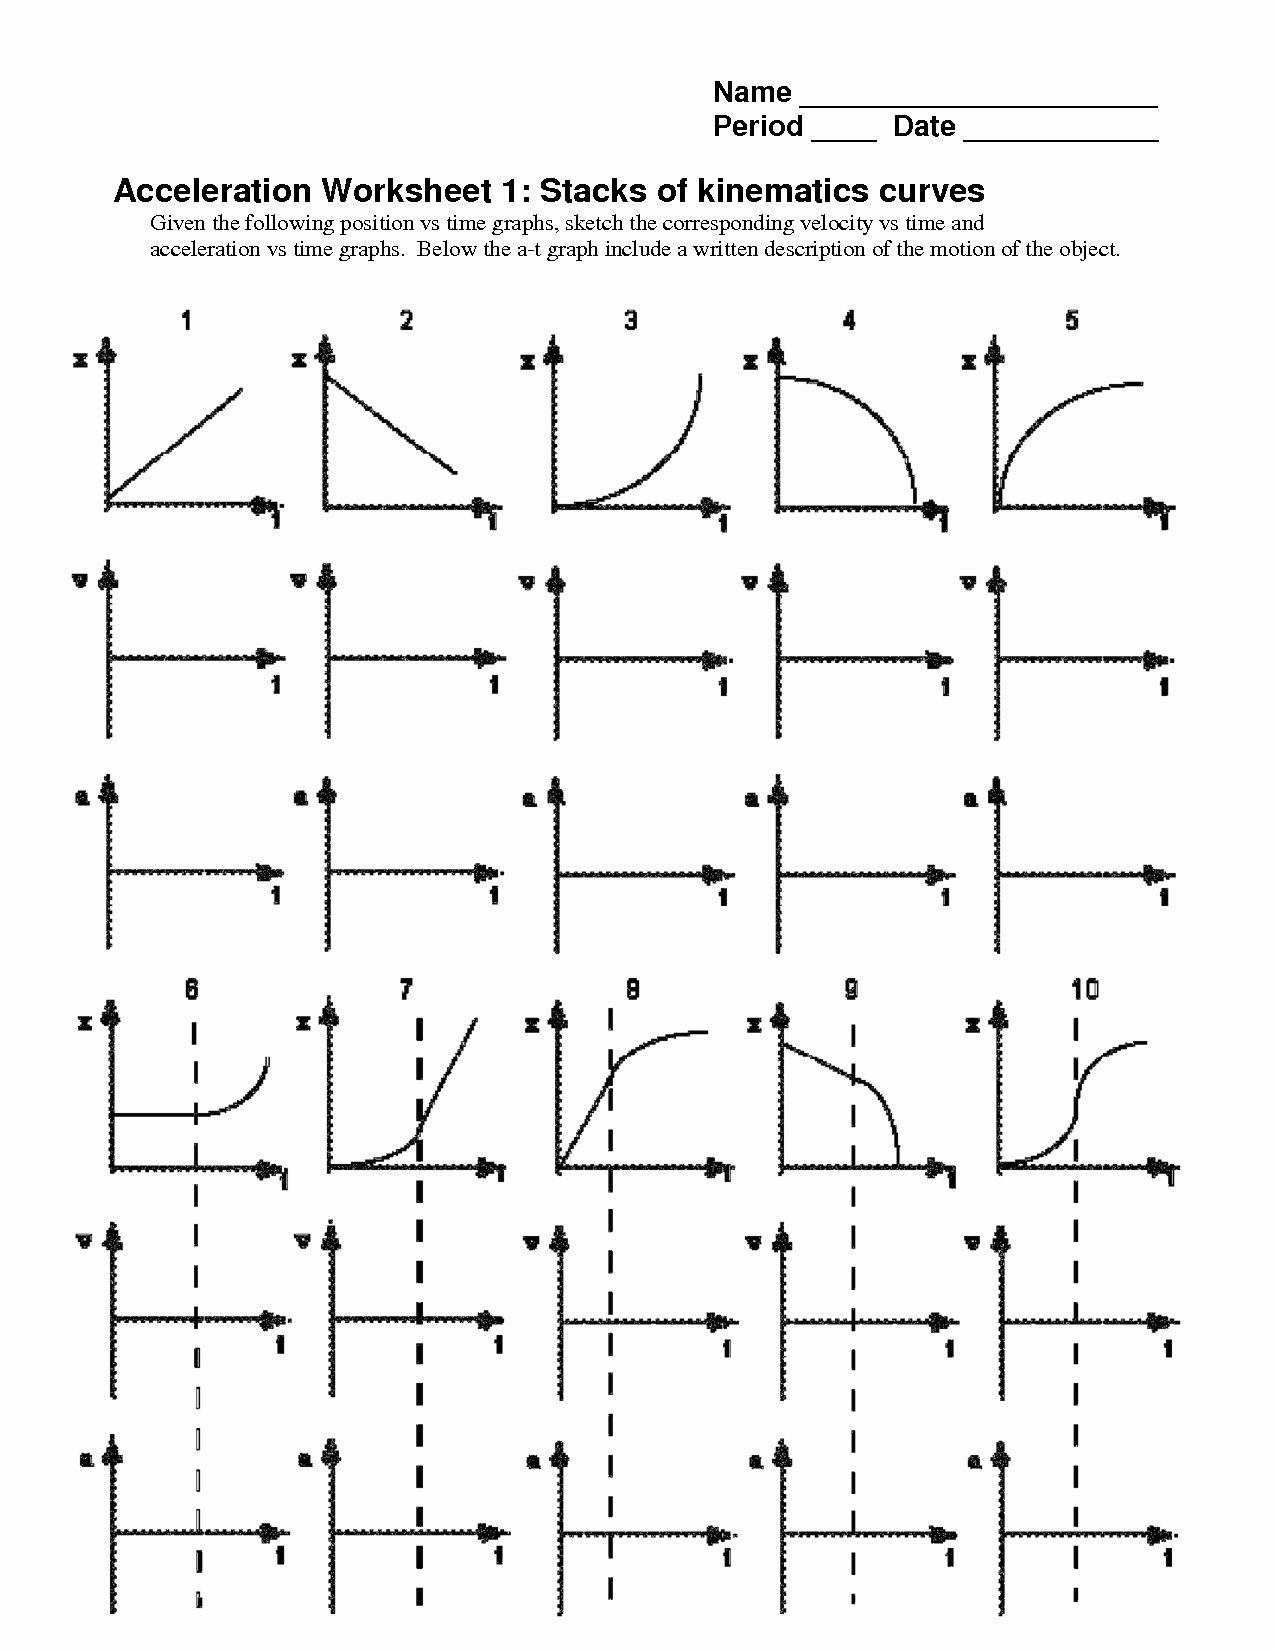 Motion Graphs Worksheet Answer Key Inspirational